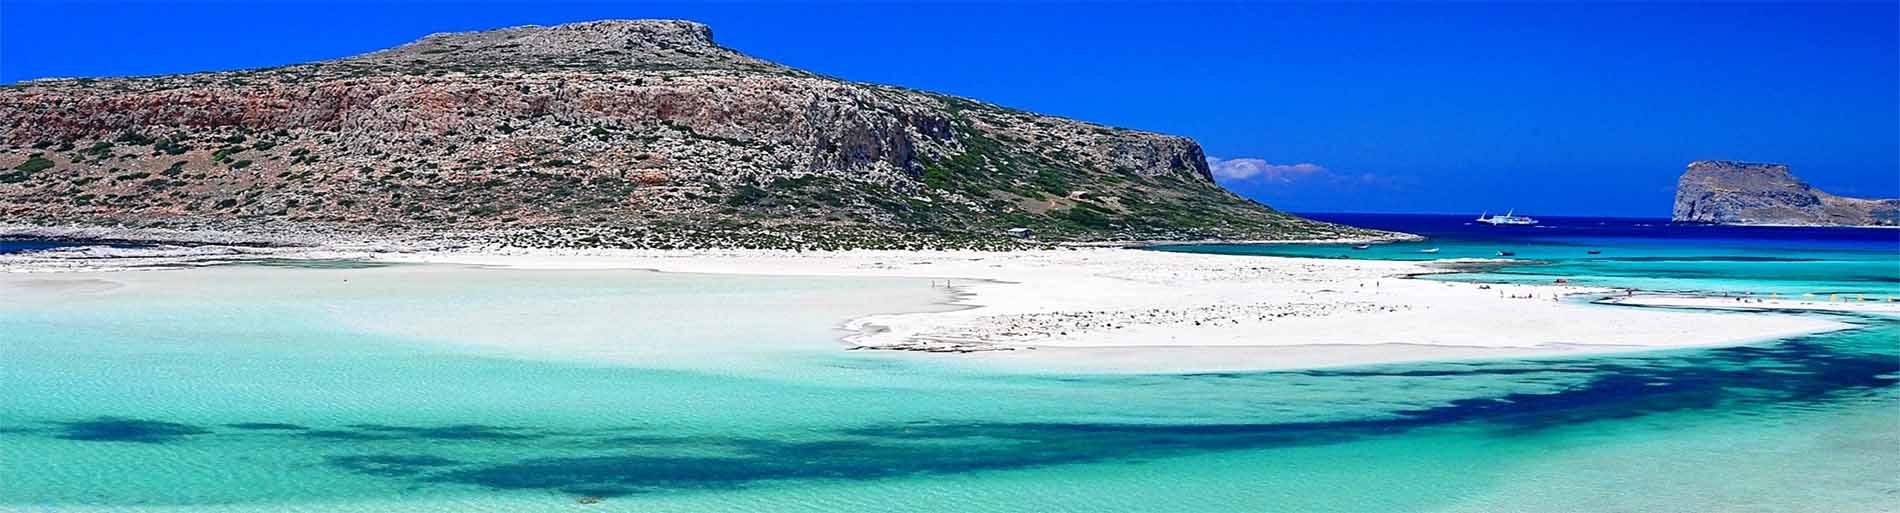 Grčka ostrva avionom leto 2021